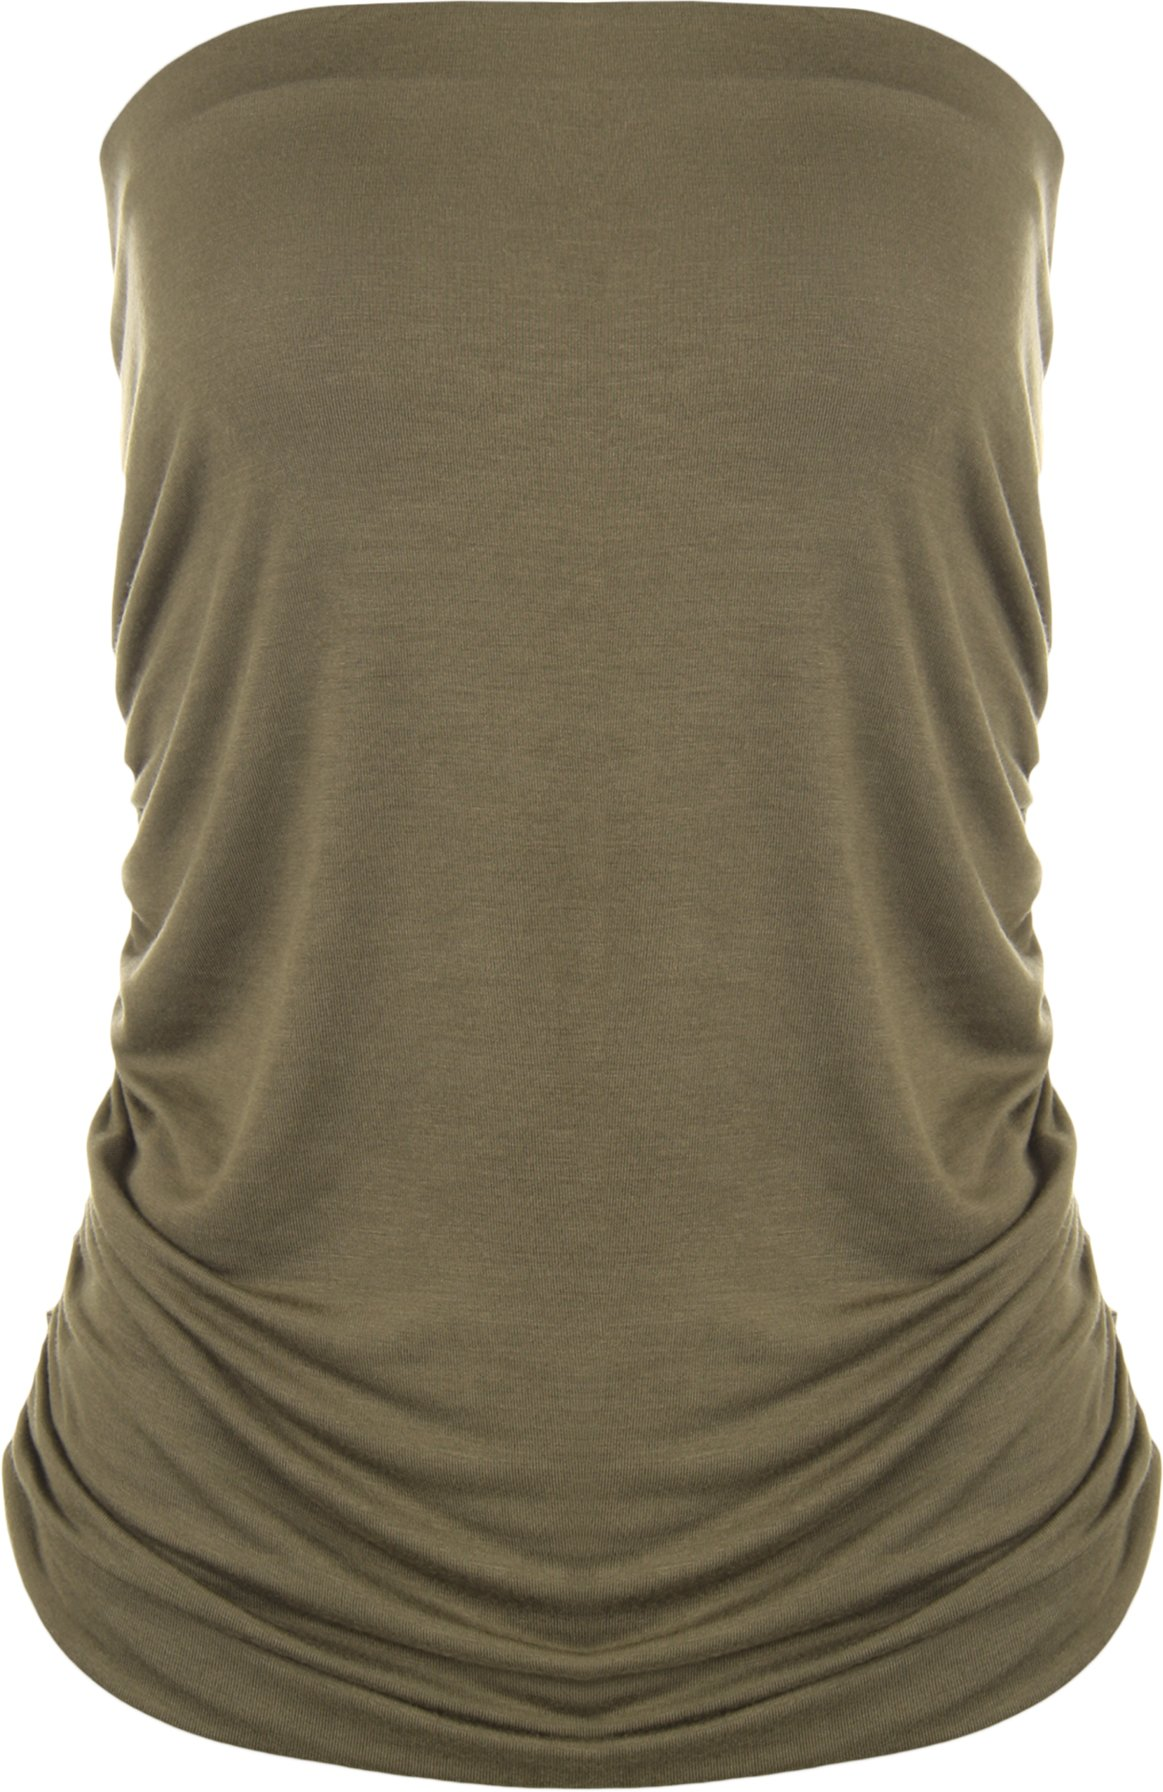 WearAll Plus Size Plain Bandeau Top - Khaki - US 20-22 (UK 24-26)